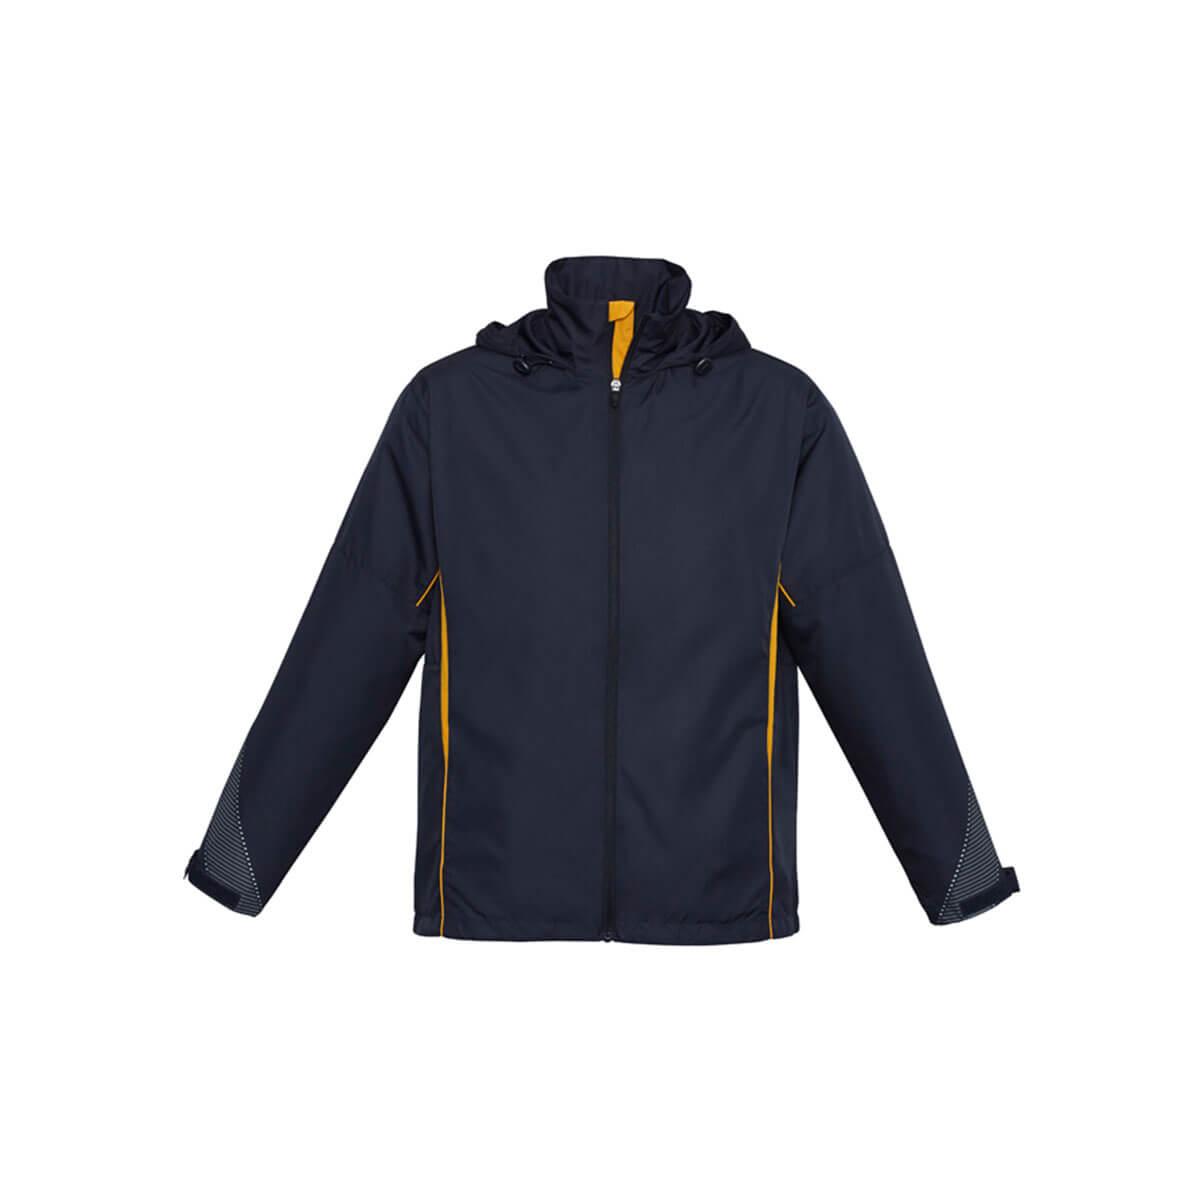 Adults Razor Team Jacket-Navy / Gold